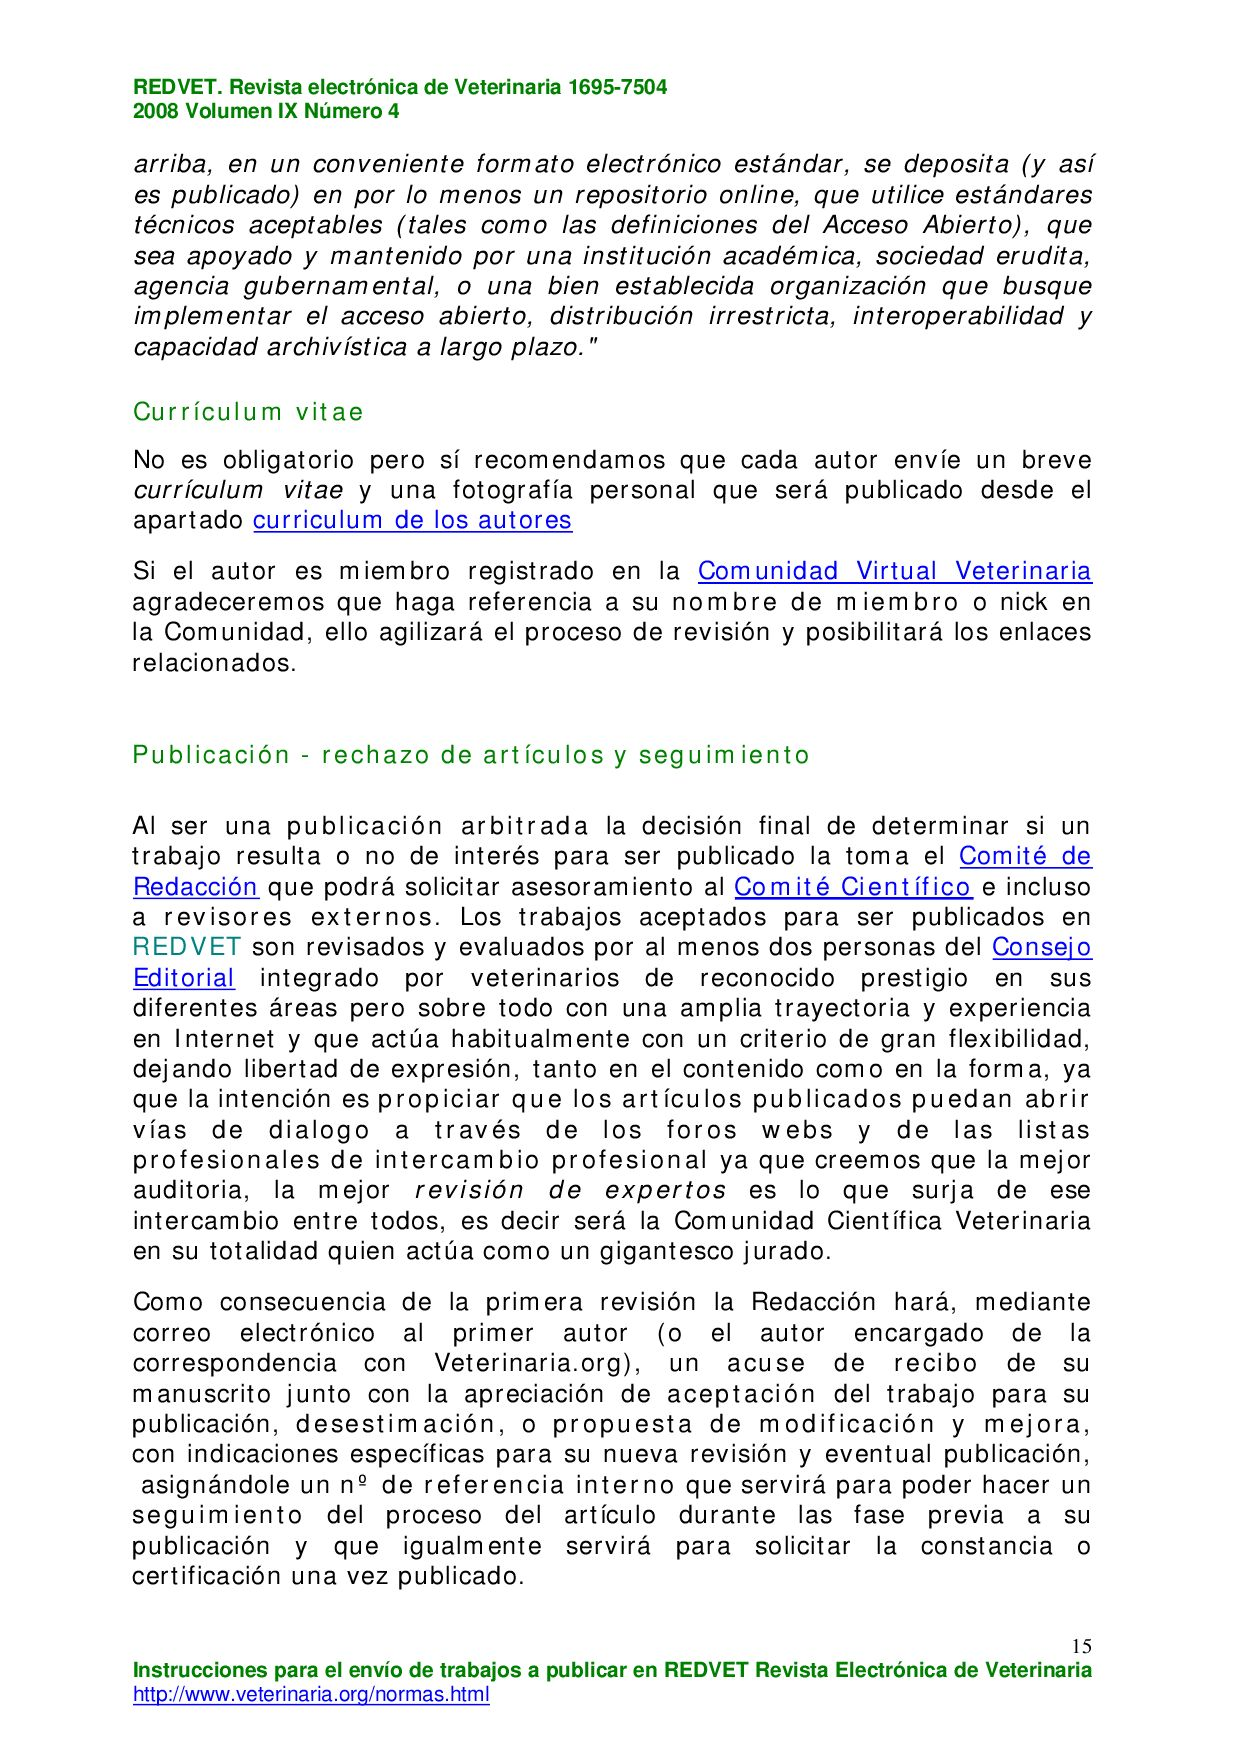 REDVET Vol.IX nº11 Noviembre/2008 by Veterinaria Organizacion ...